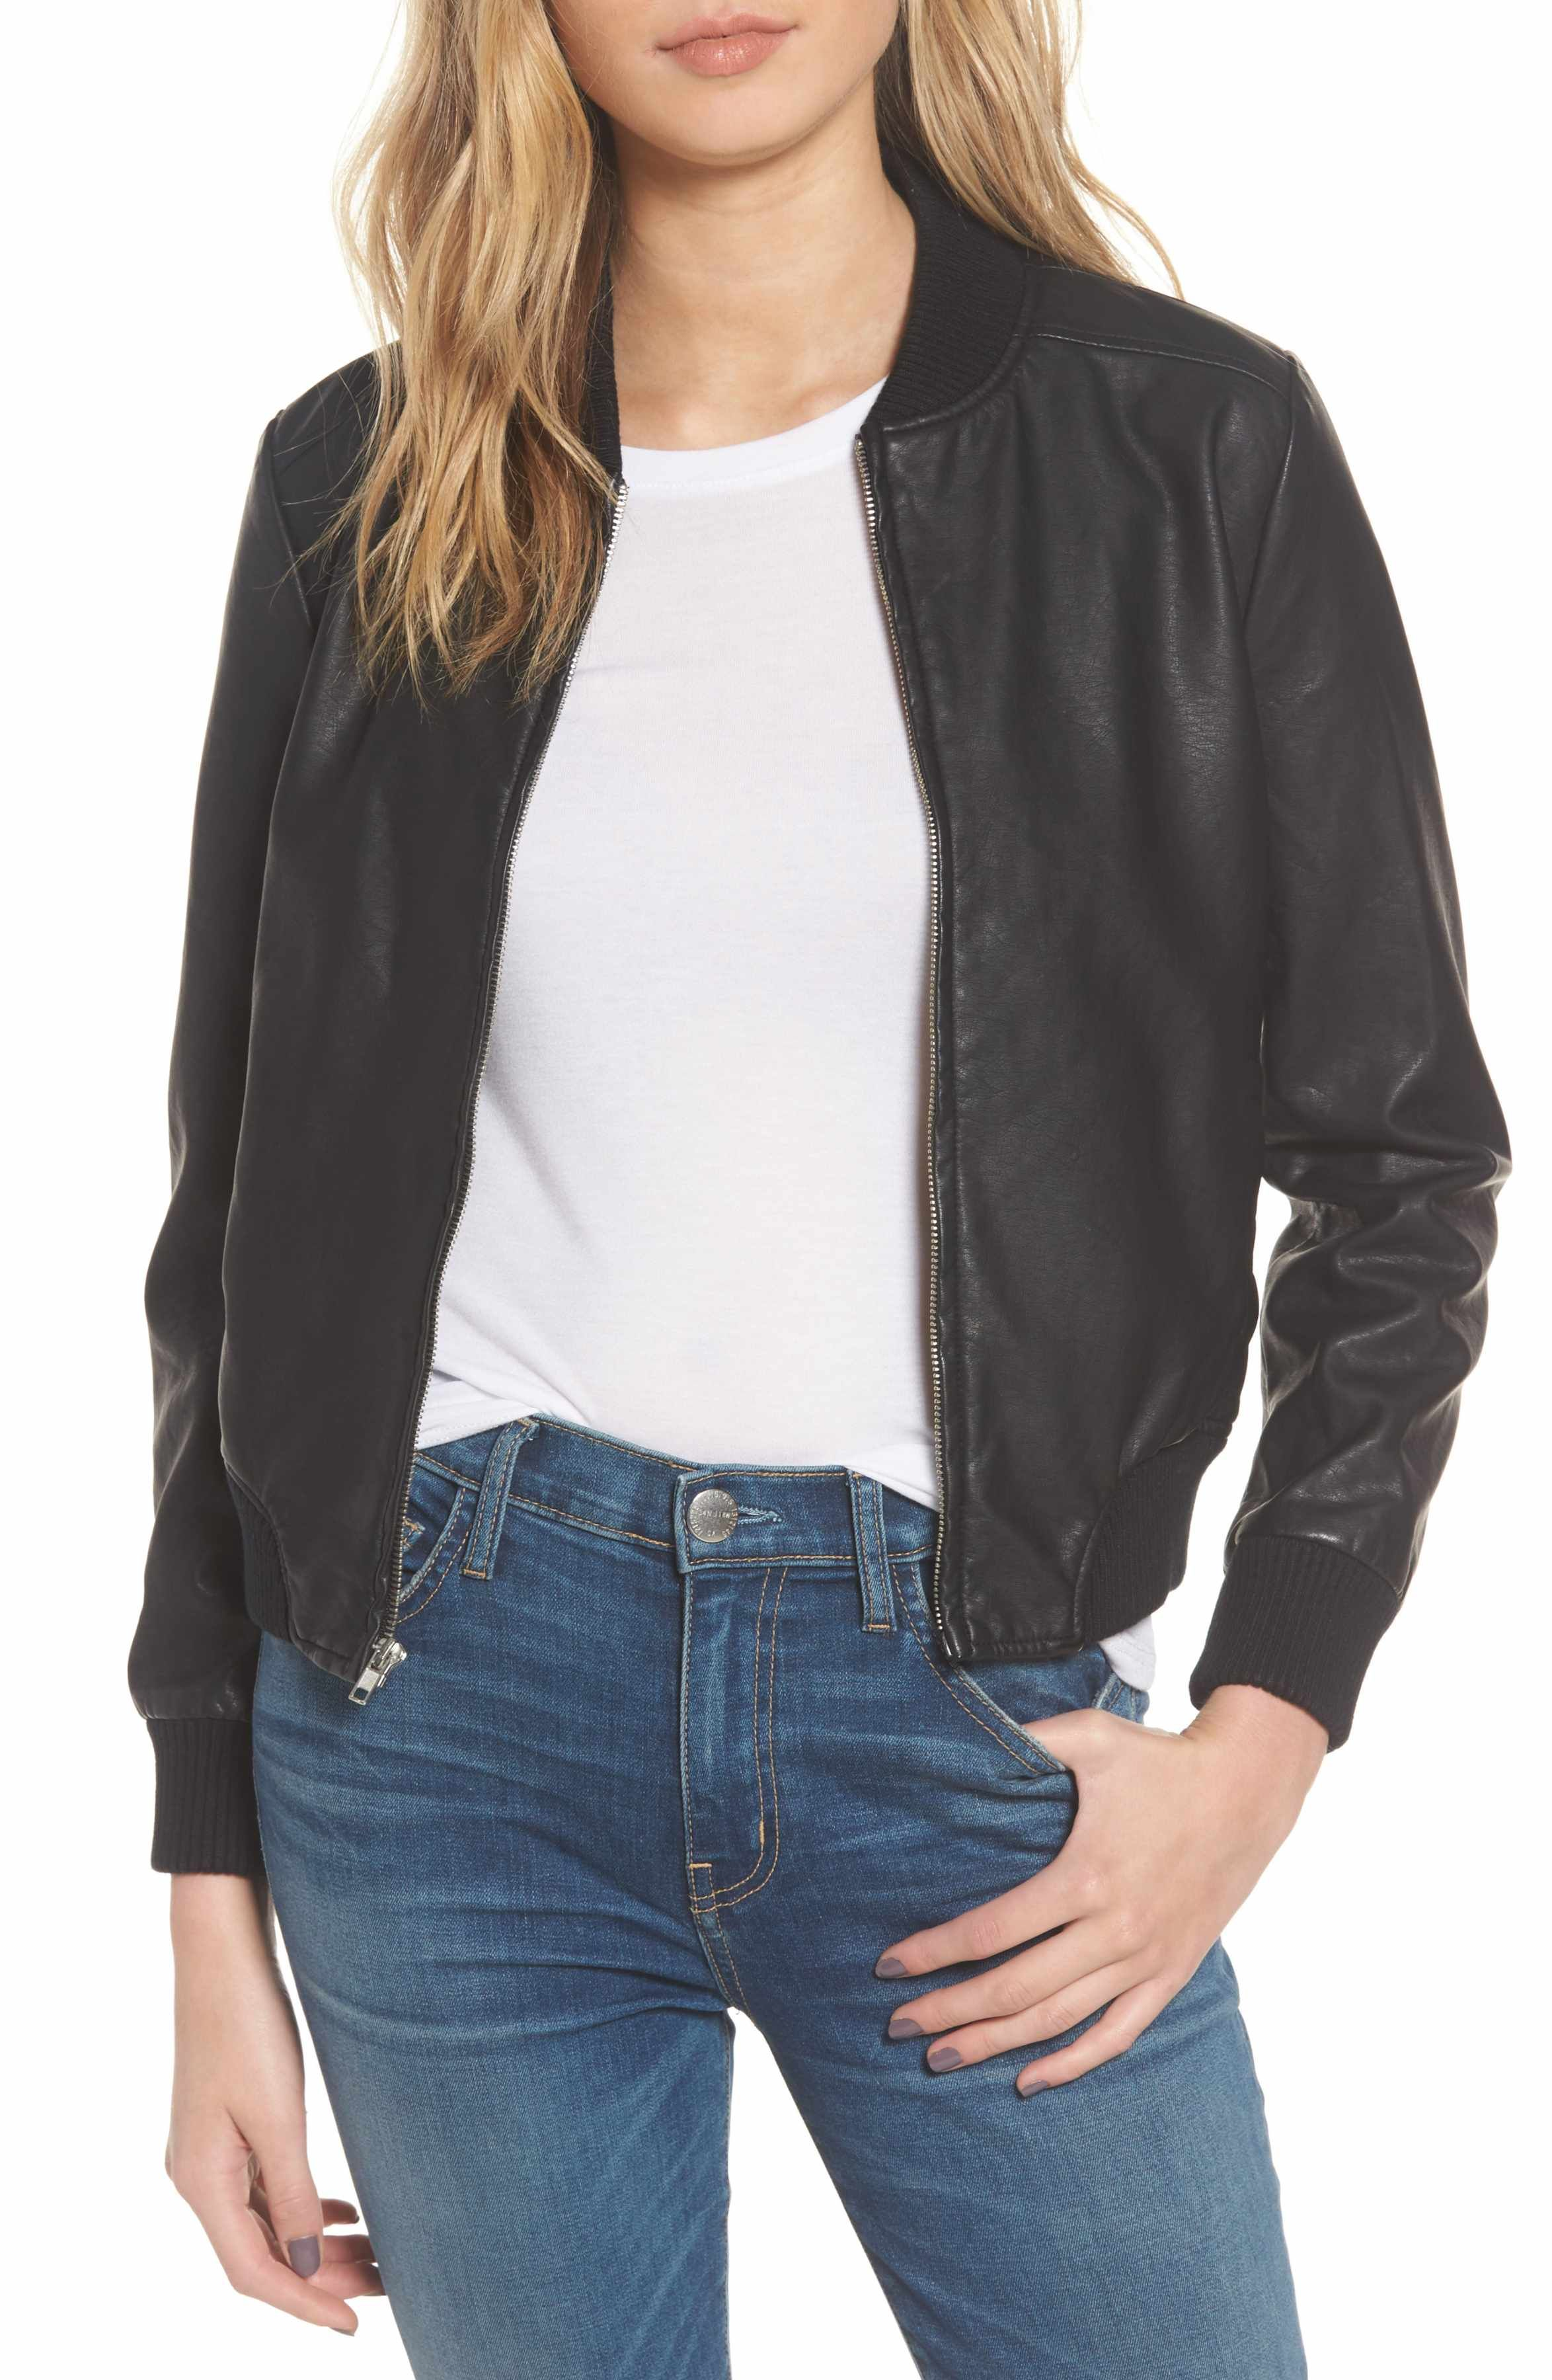 Bb Dakota Gavin Faux Leather Bomber Jacket Nordstrom Faux Leather Bomber Jacket Bomber Jacket Coats For Women [ 3600 x 2348 Pixel ]